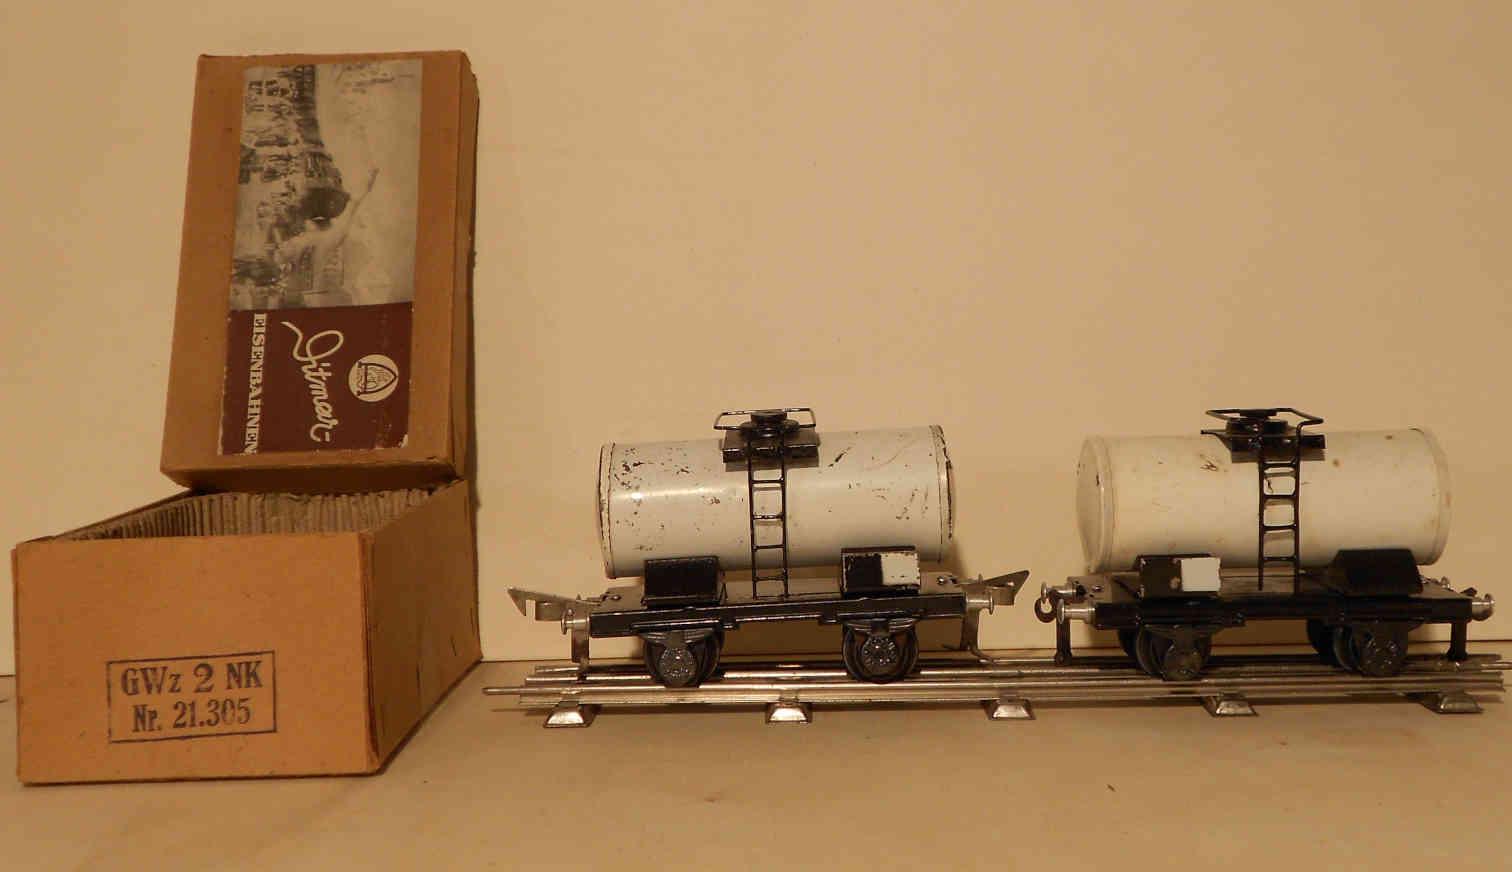 ditmar gwz2 21.305 railway toy tank car gauge 0